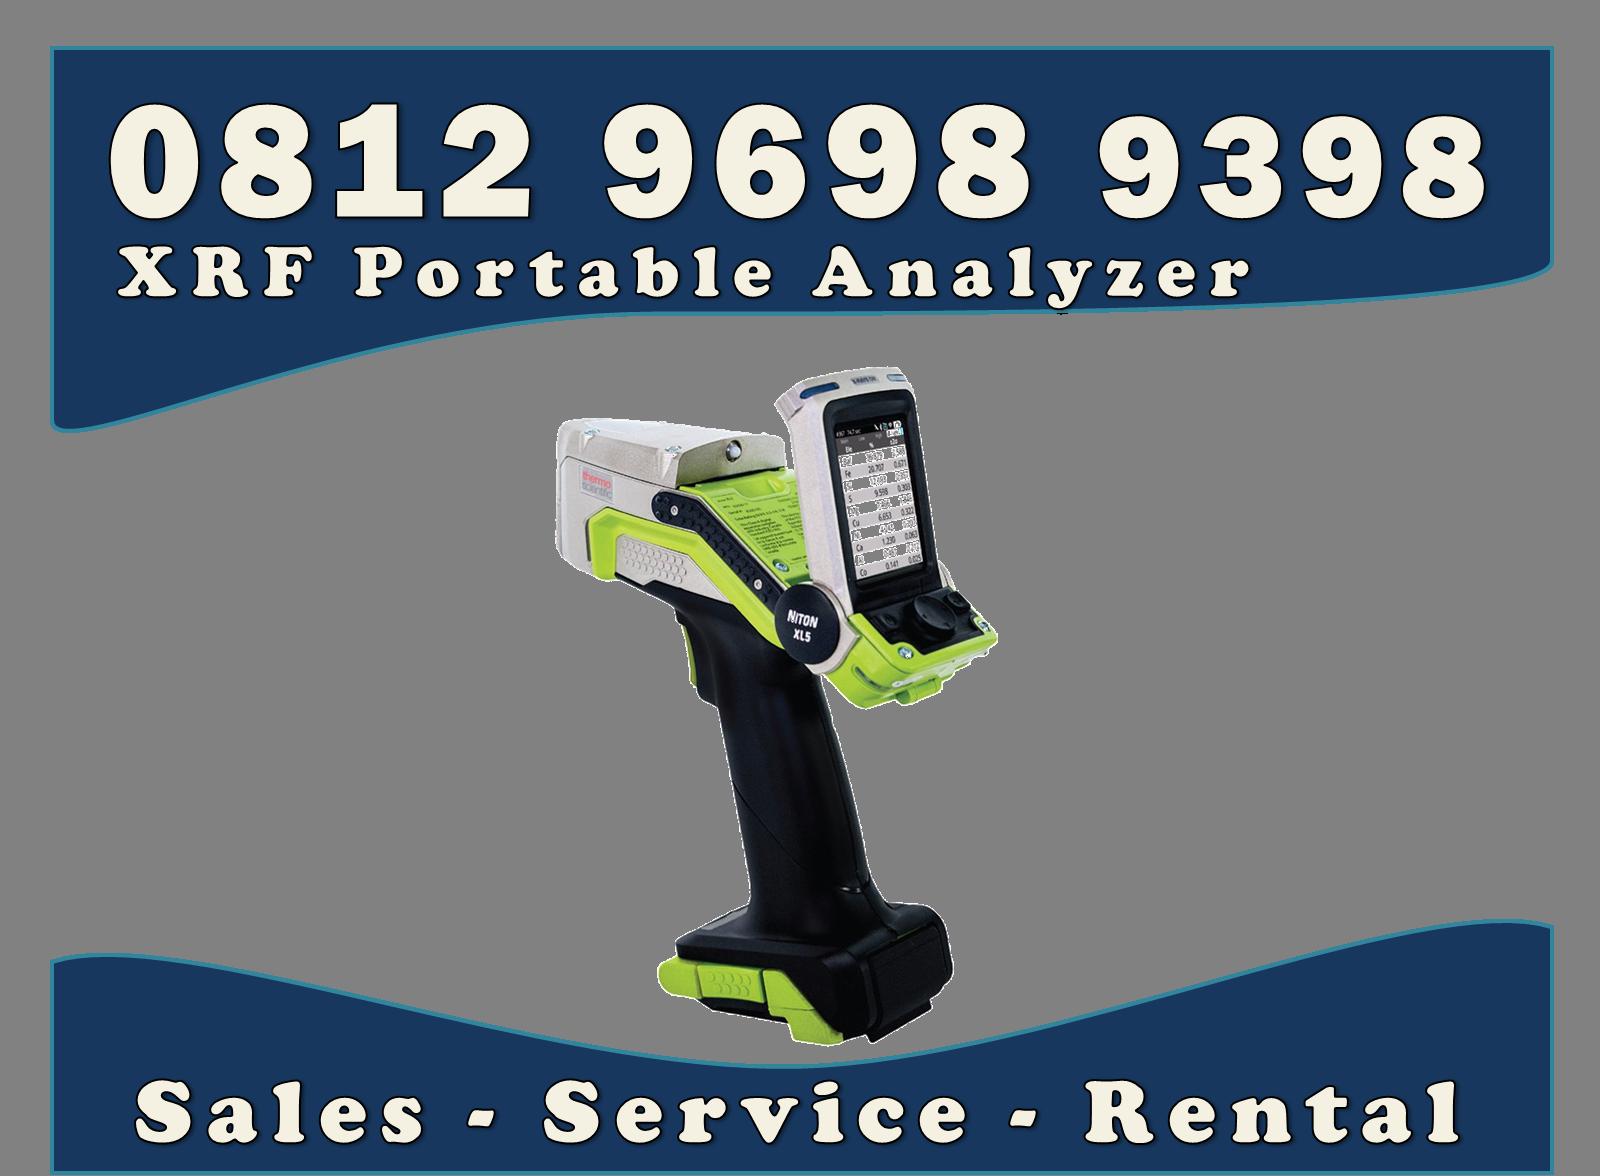 Cepat Telp Wa 0812 9698 9398 Olympus Delta Professional Handheld Xrf Analyzer Kab Malang Jawa T Di 2020 Kota Bukittinggi Pulau Bangka Kota Manado